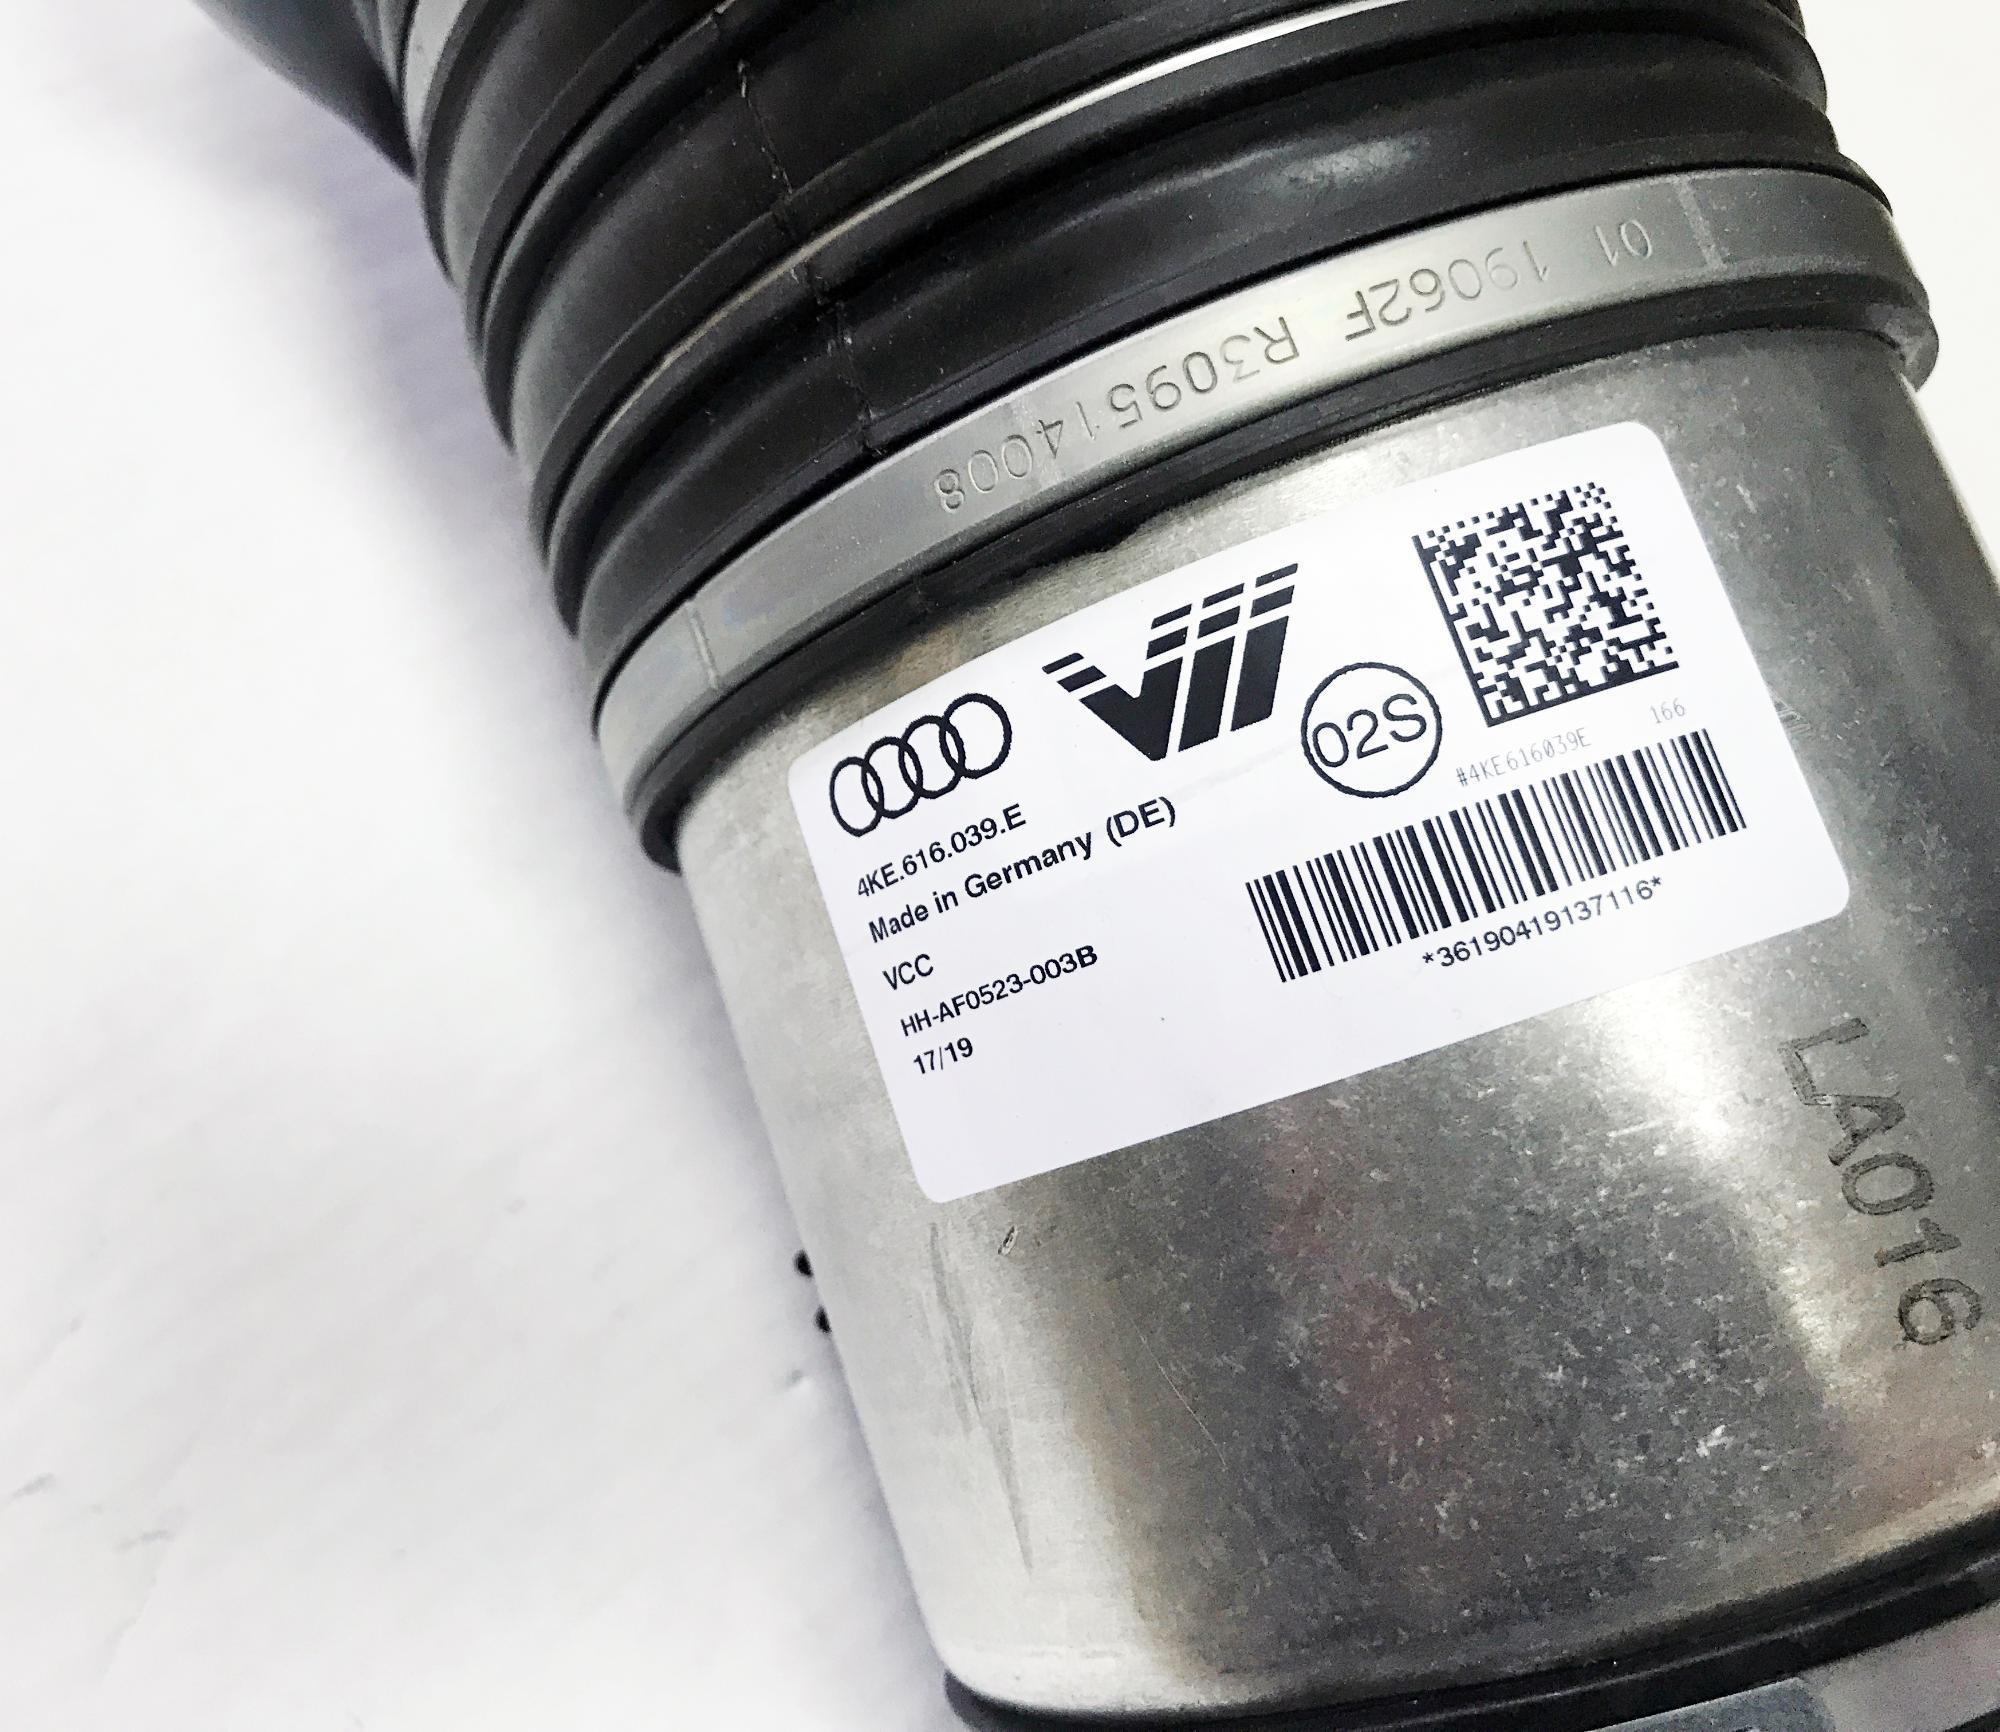 картинка Оригинальная передняя пневмостойка VAG для Audi A7 4K8, A6 C8 4K (4K0616039E) от магазина пневмоподвески ПневмоМаркет